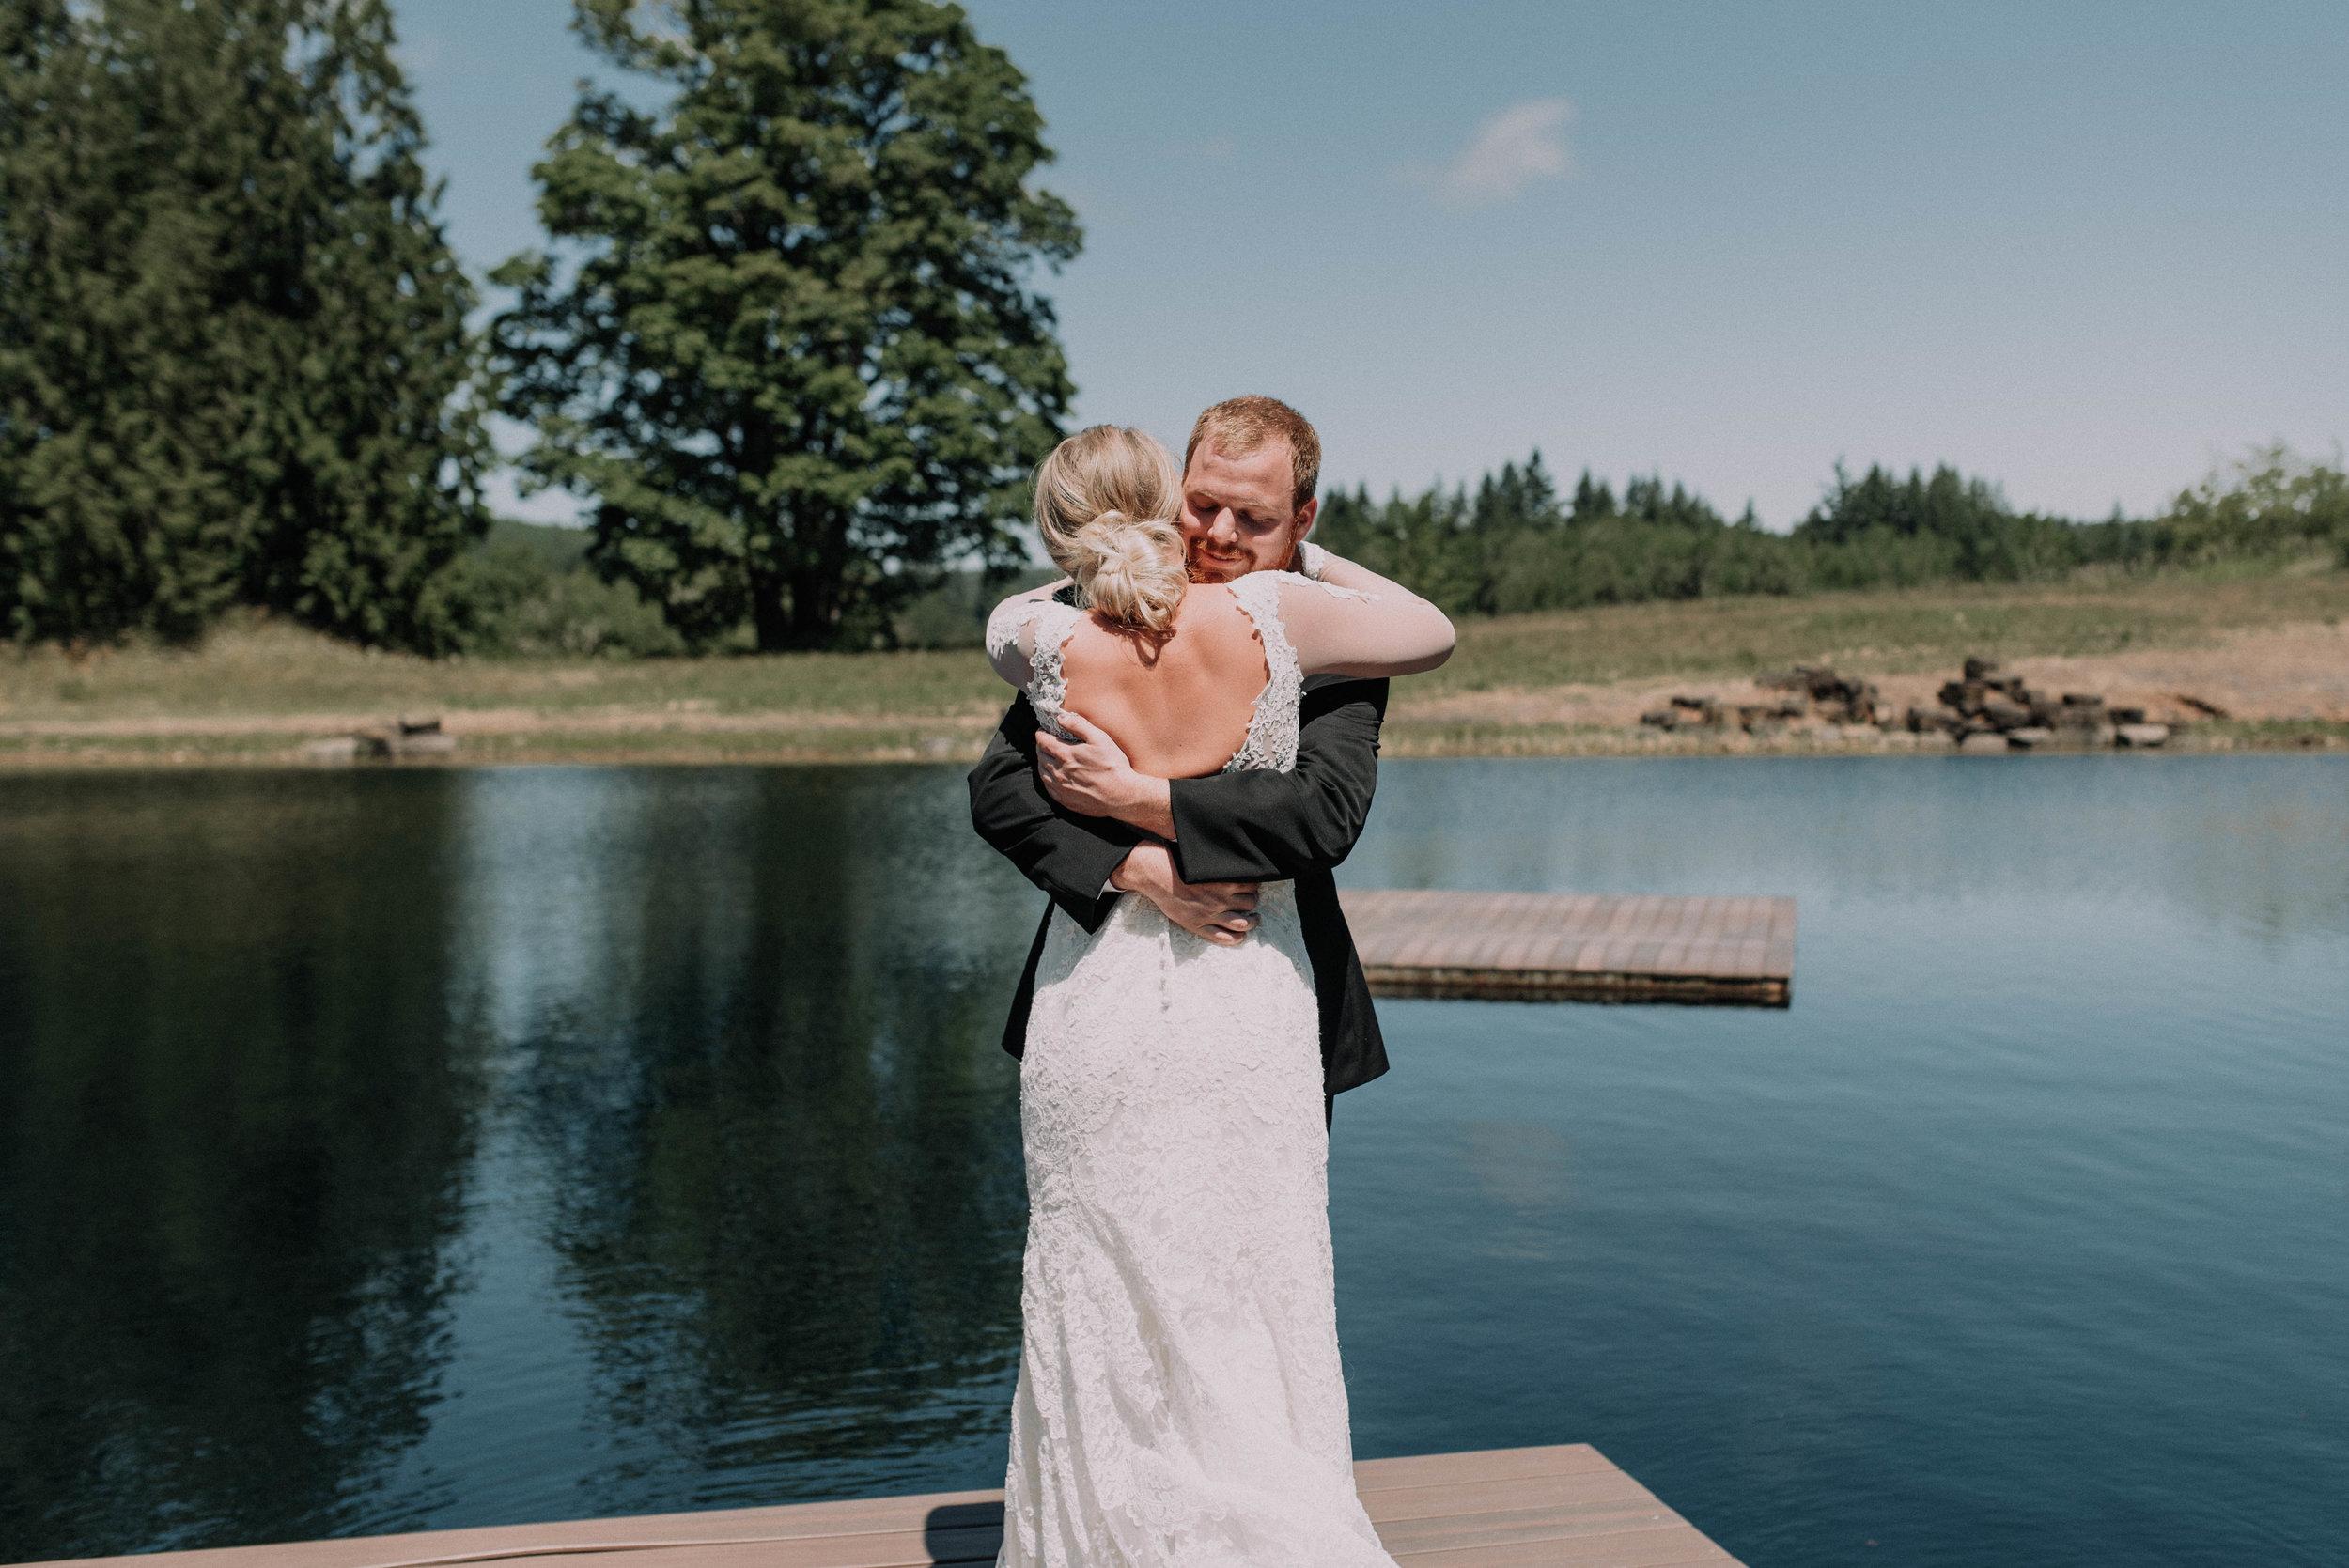 Formal Photos - M&E 007.jpg